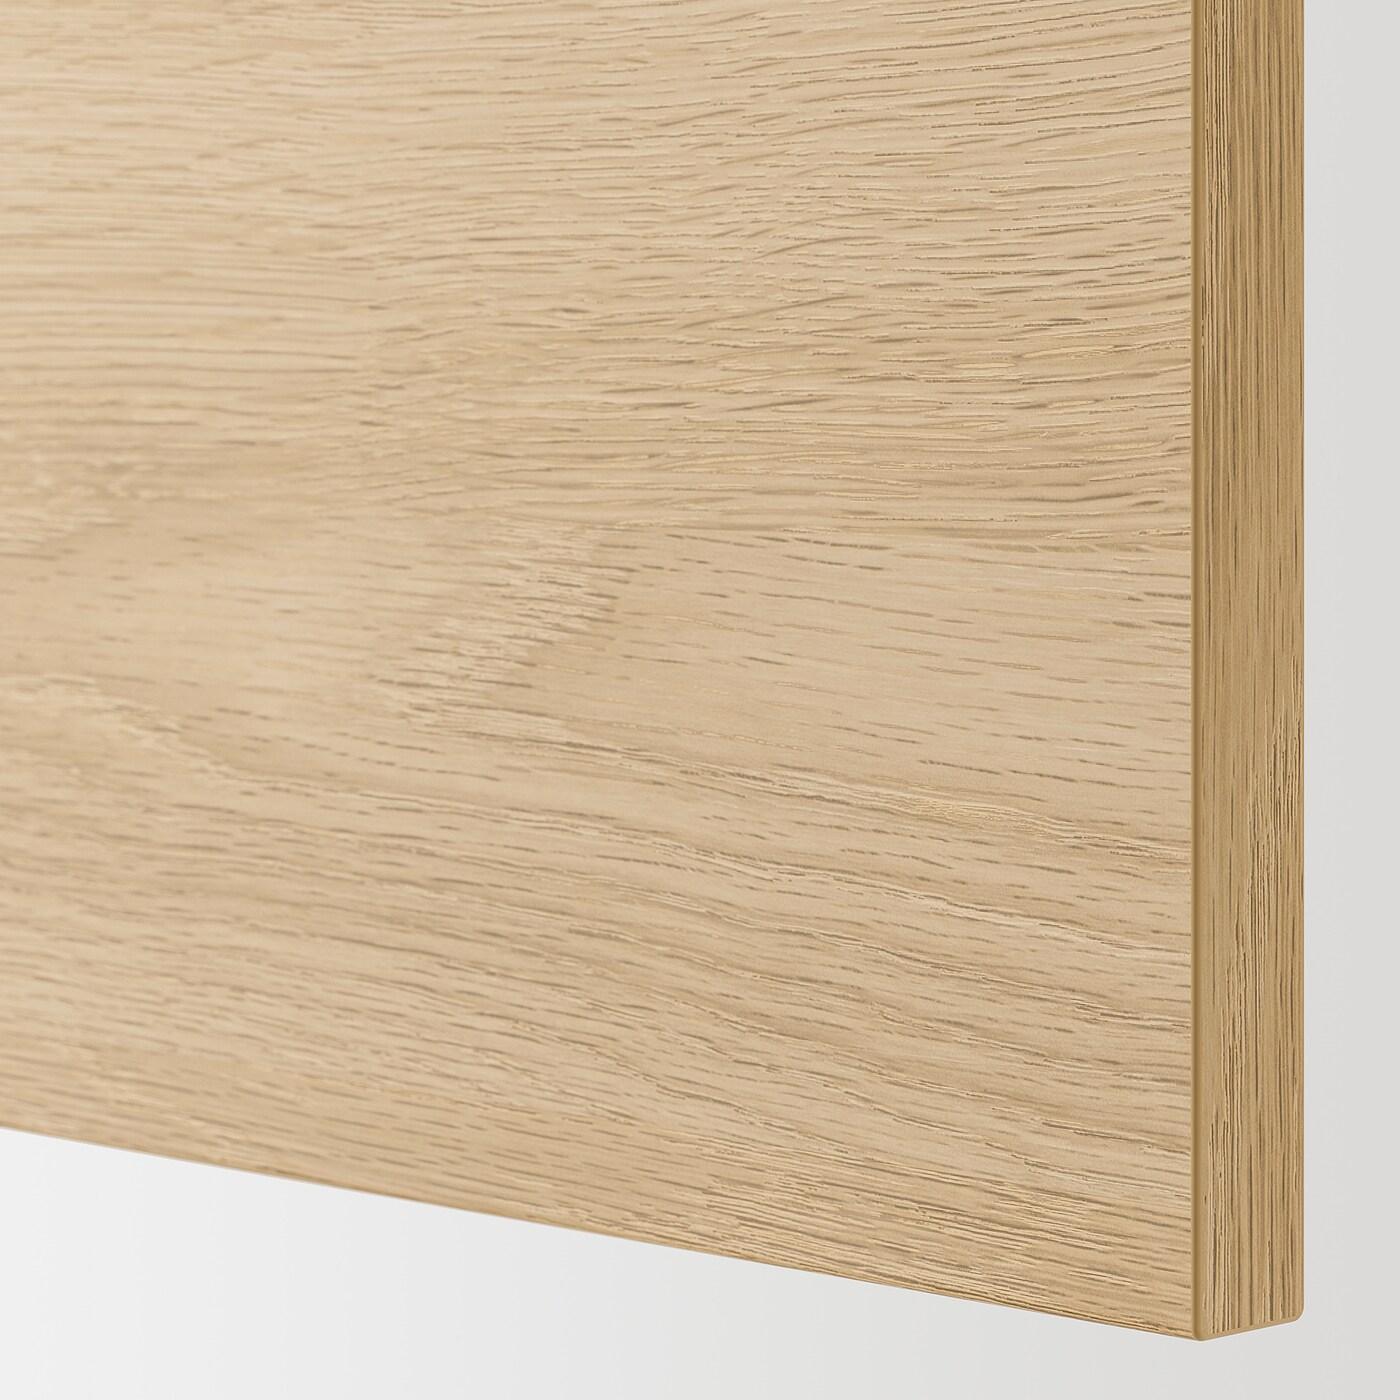 ENHET خزانة قاعدة مع رف/باب, أبيض/شكل السنديان, 40x62x75 سم